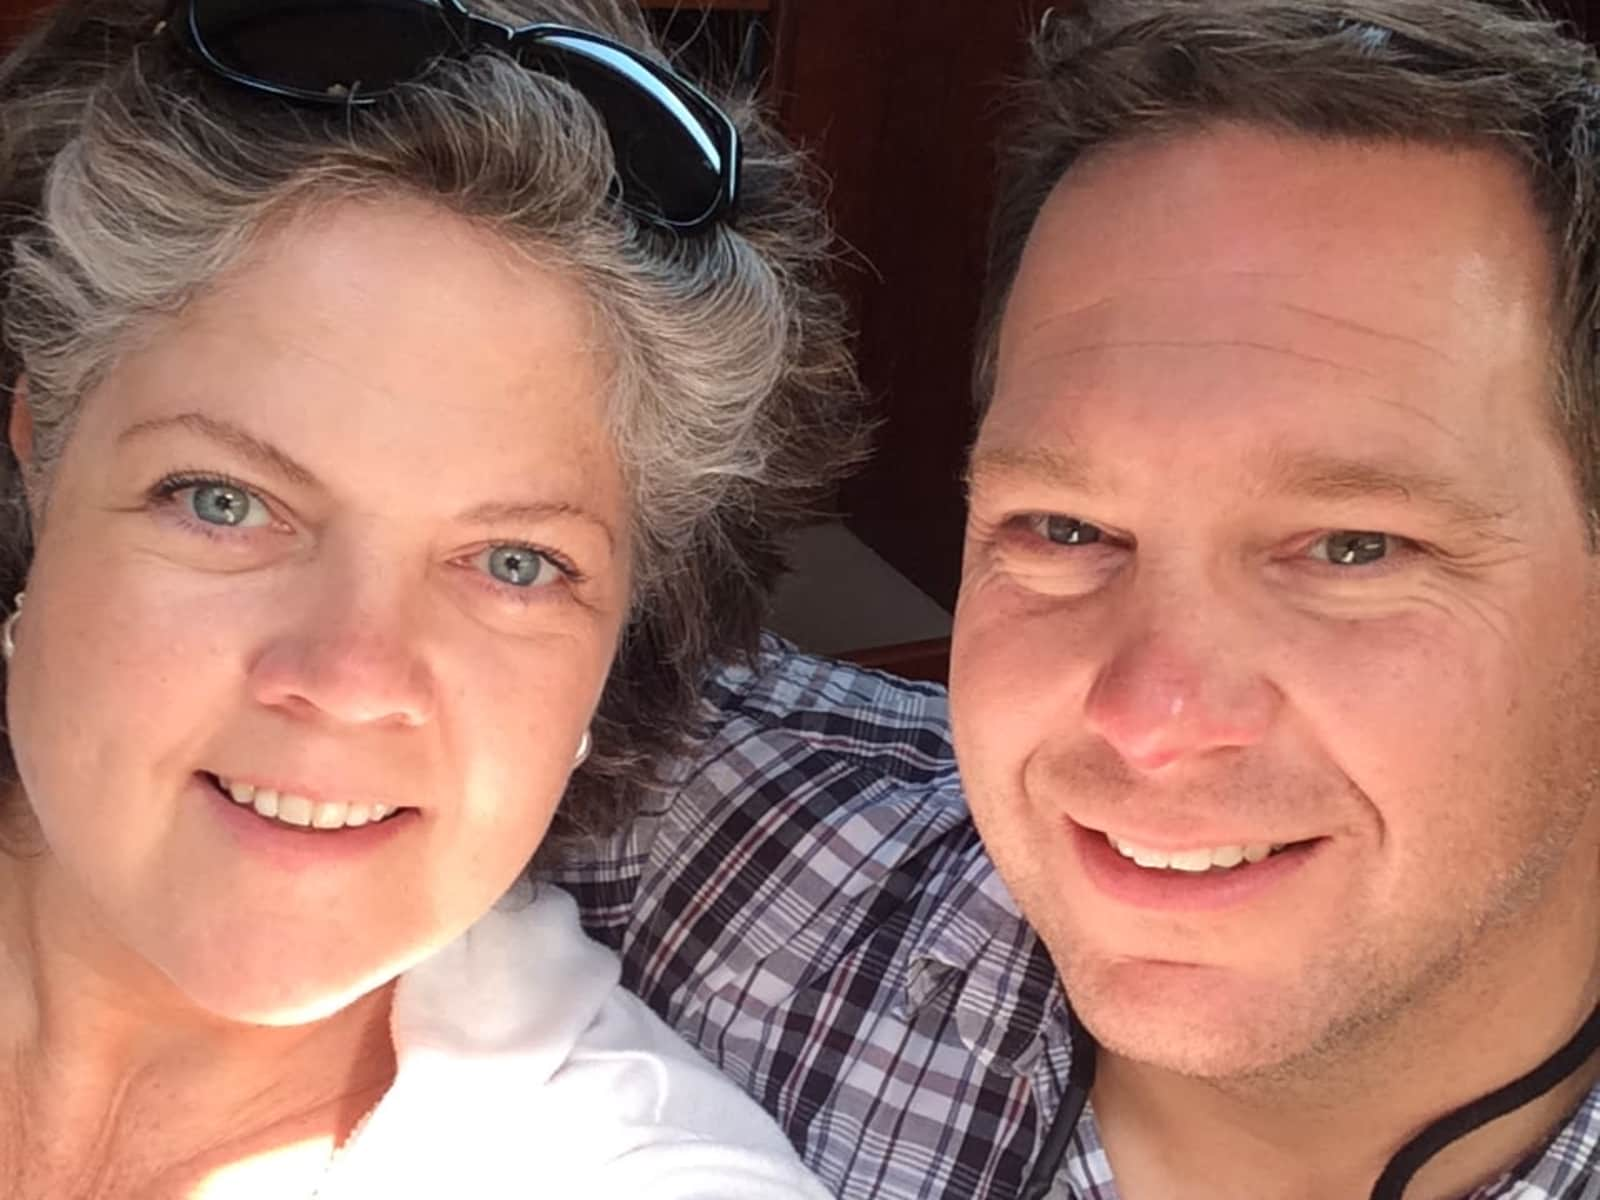 Amy & Stephen from Boston, Massachusetts, United States